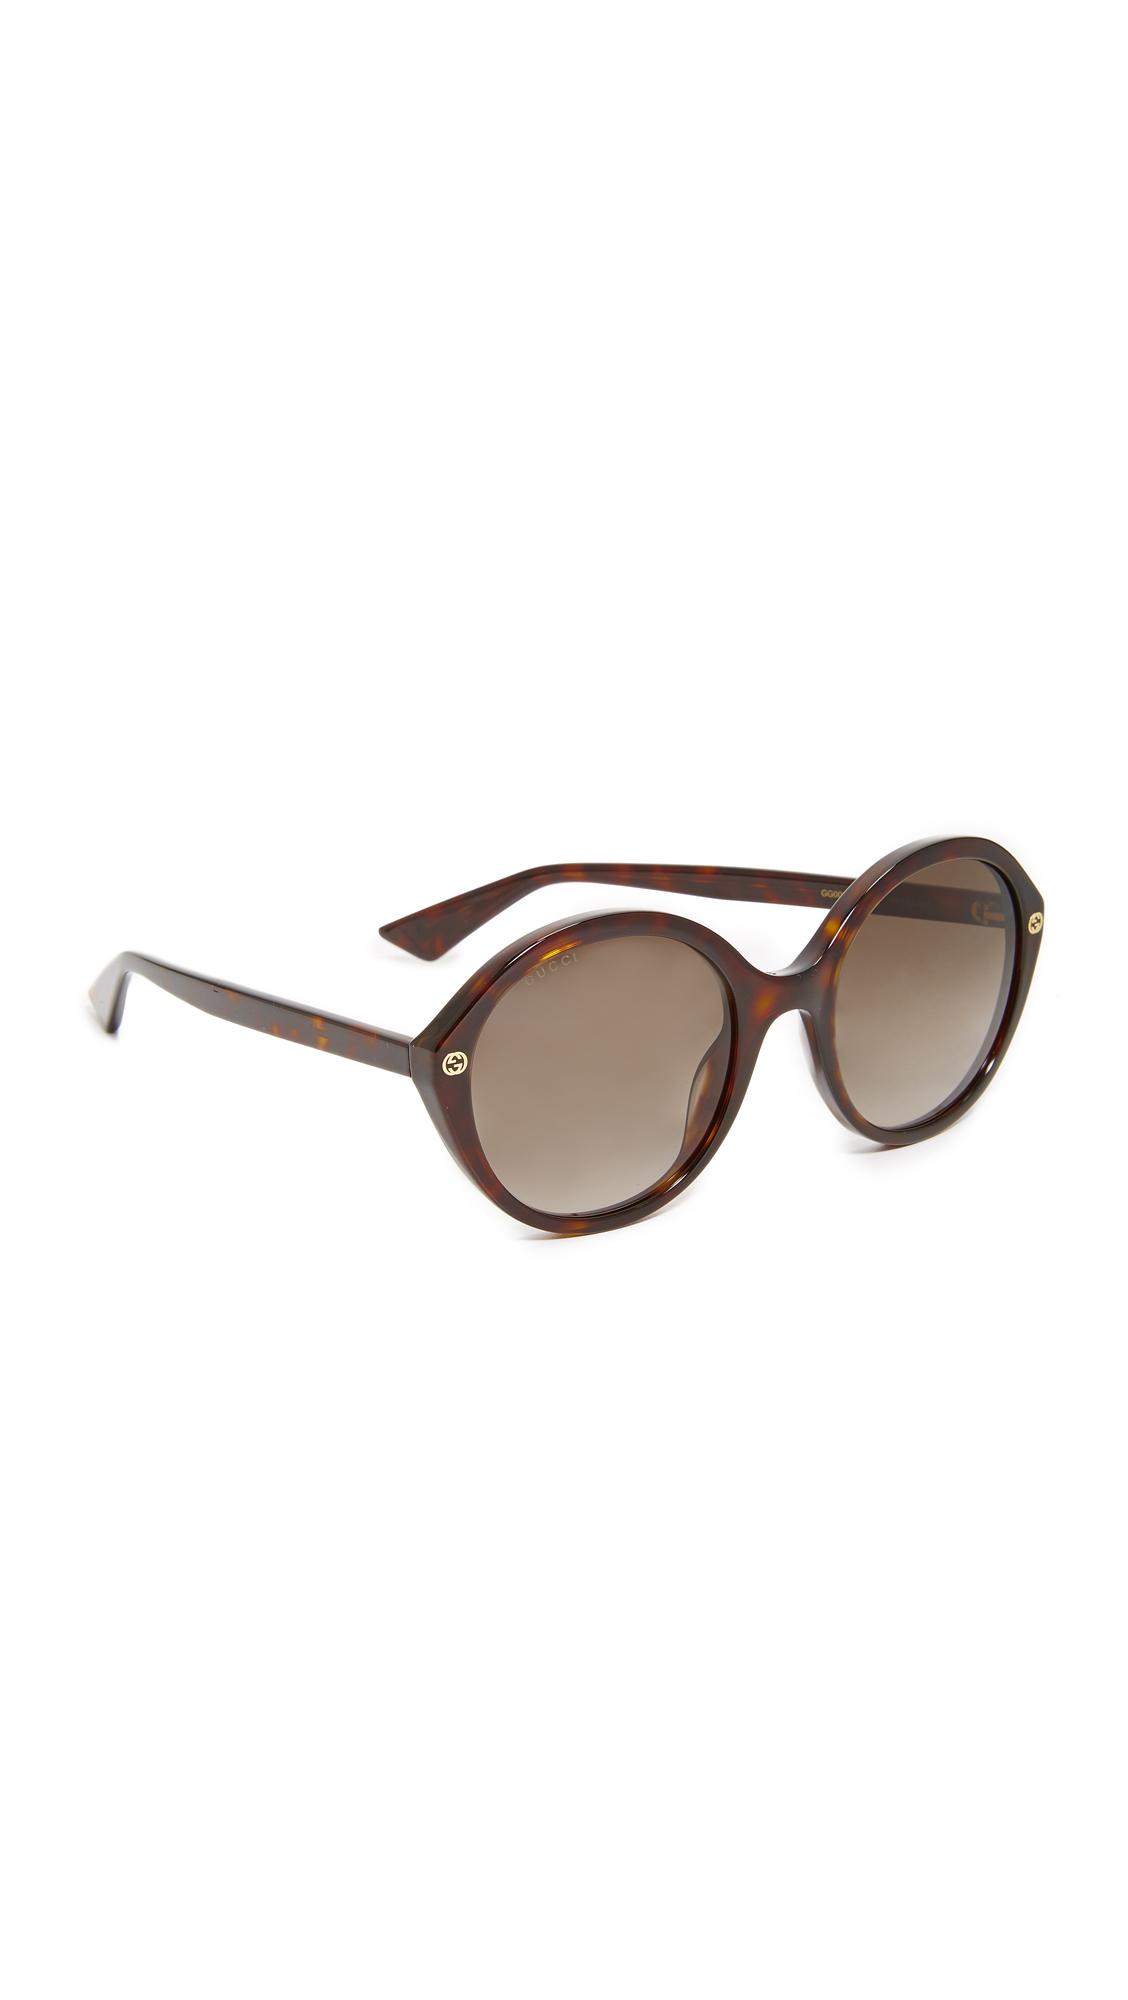 Gucci Lightness Round Sunglasses - Havana/Brown at Shopbop